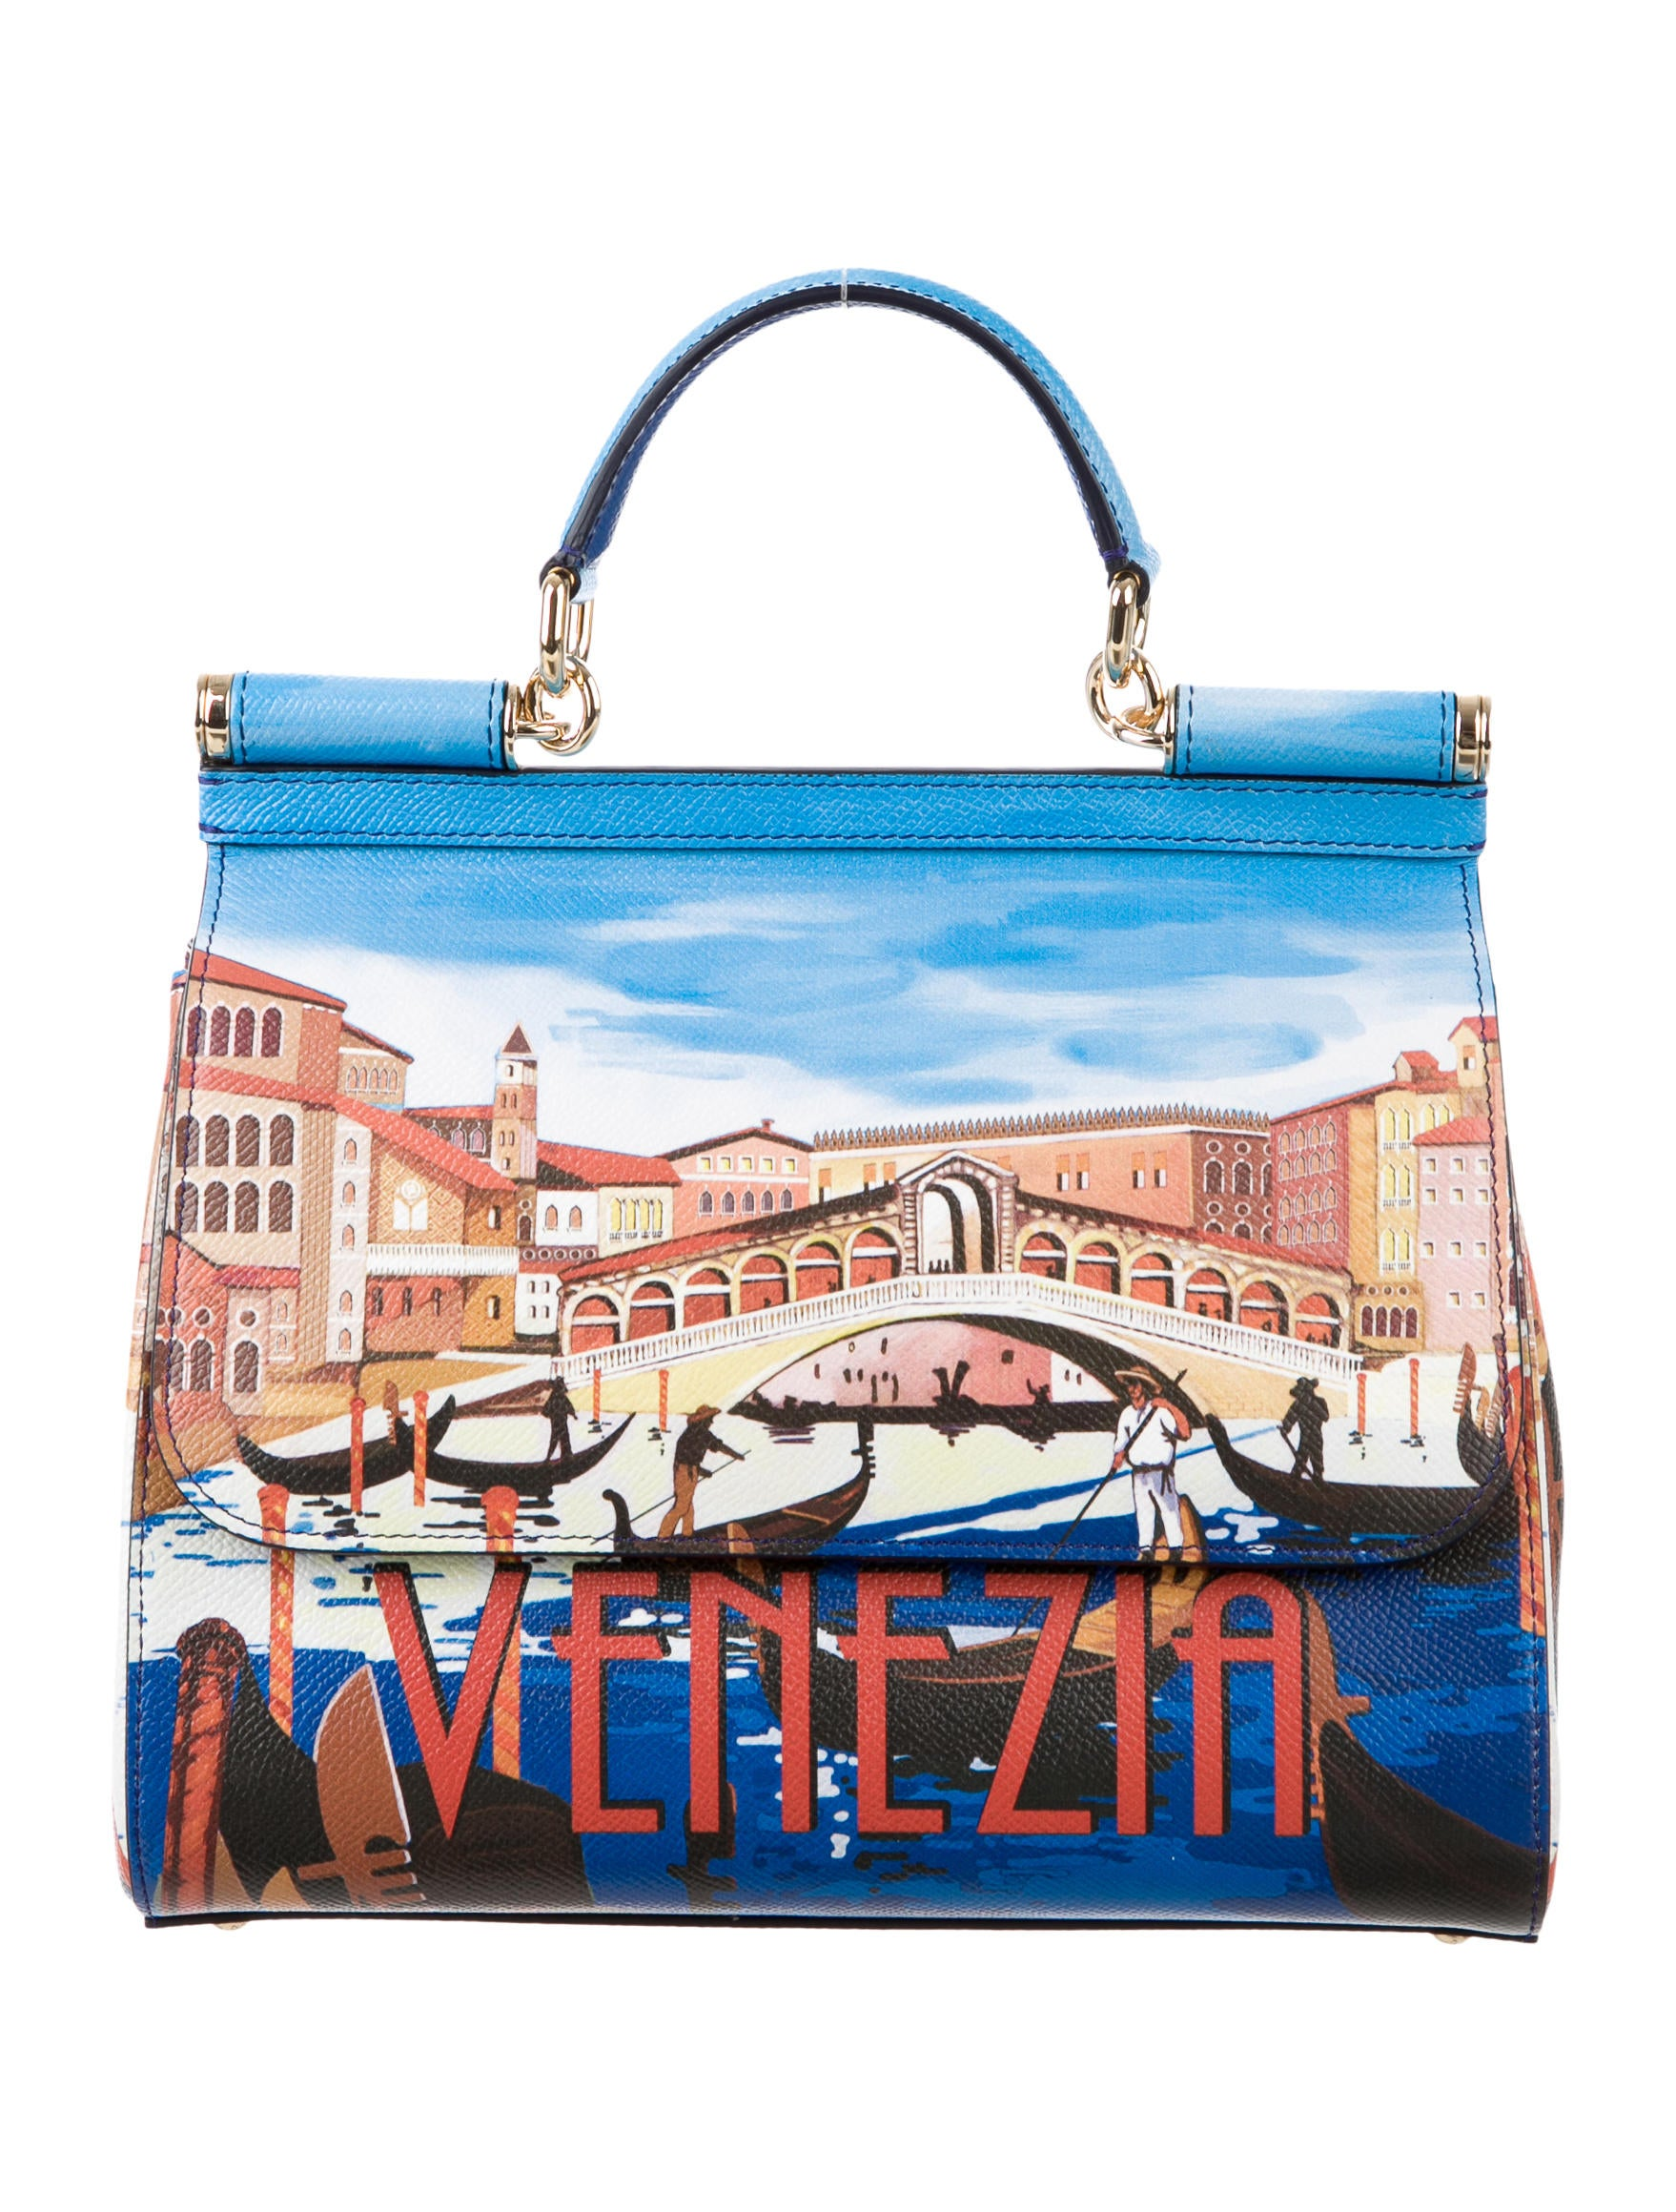 ... online store 7b664 0d5aa Dolce Gabbana 2016 Miss Sicily Venezia Bag -  Handbags - DAG80056 The ... 0b830cb8dcbe2